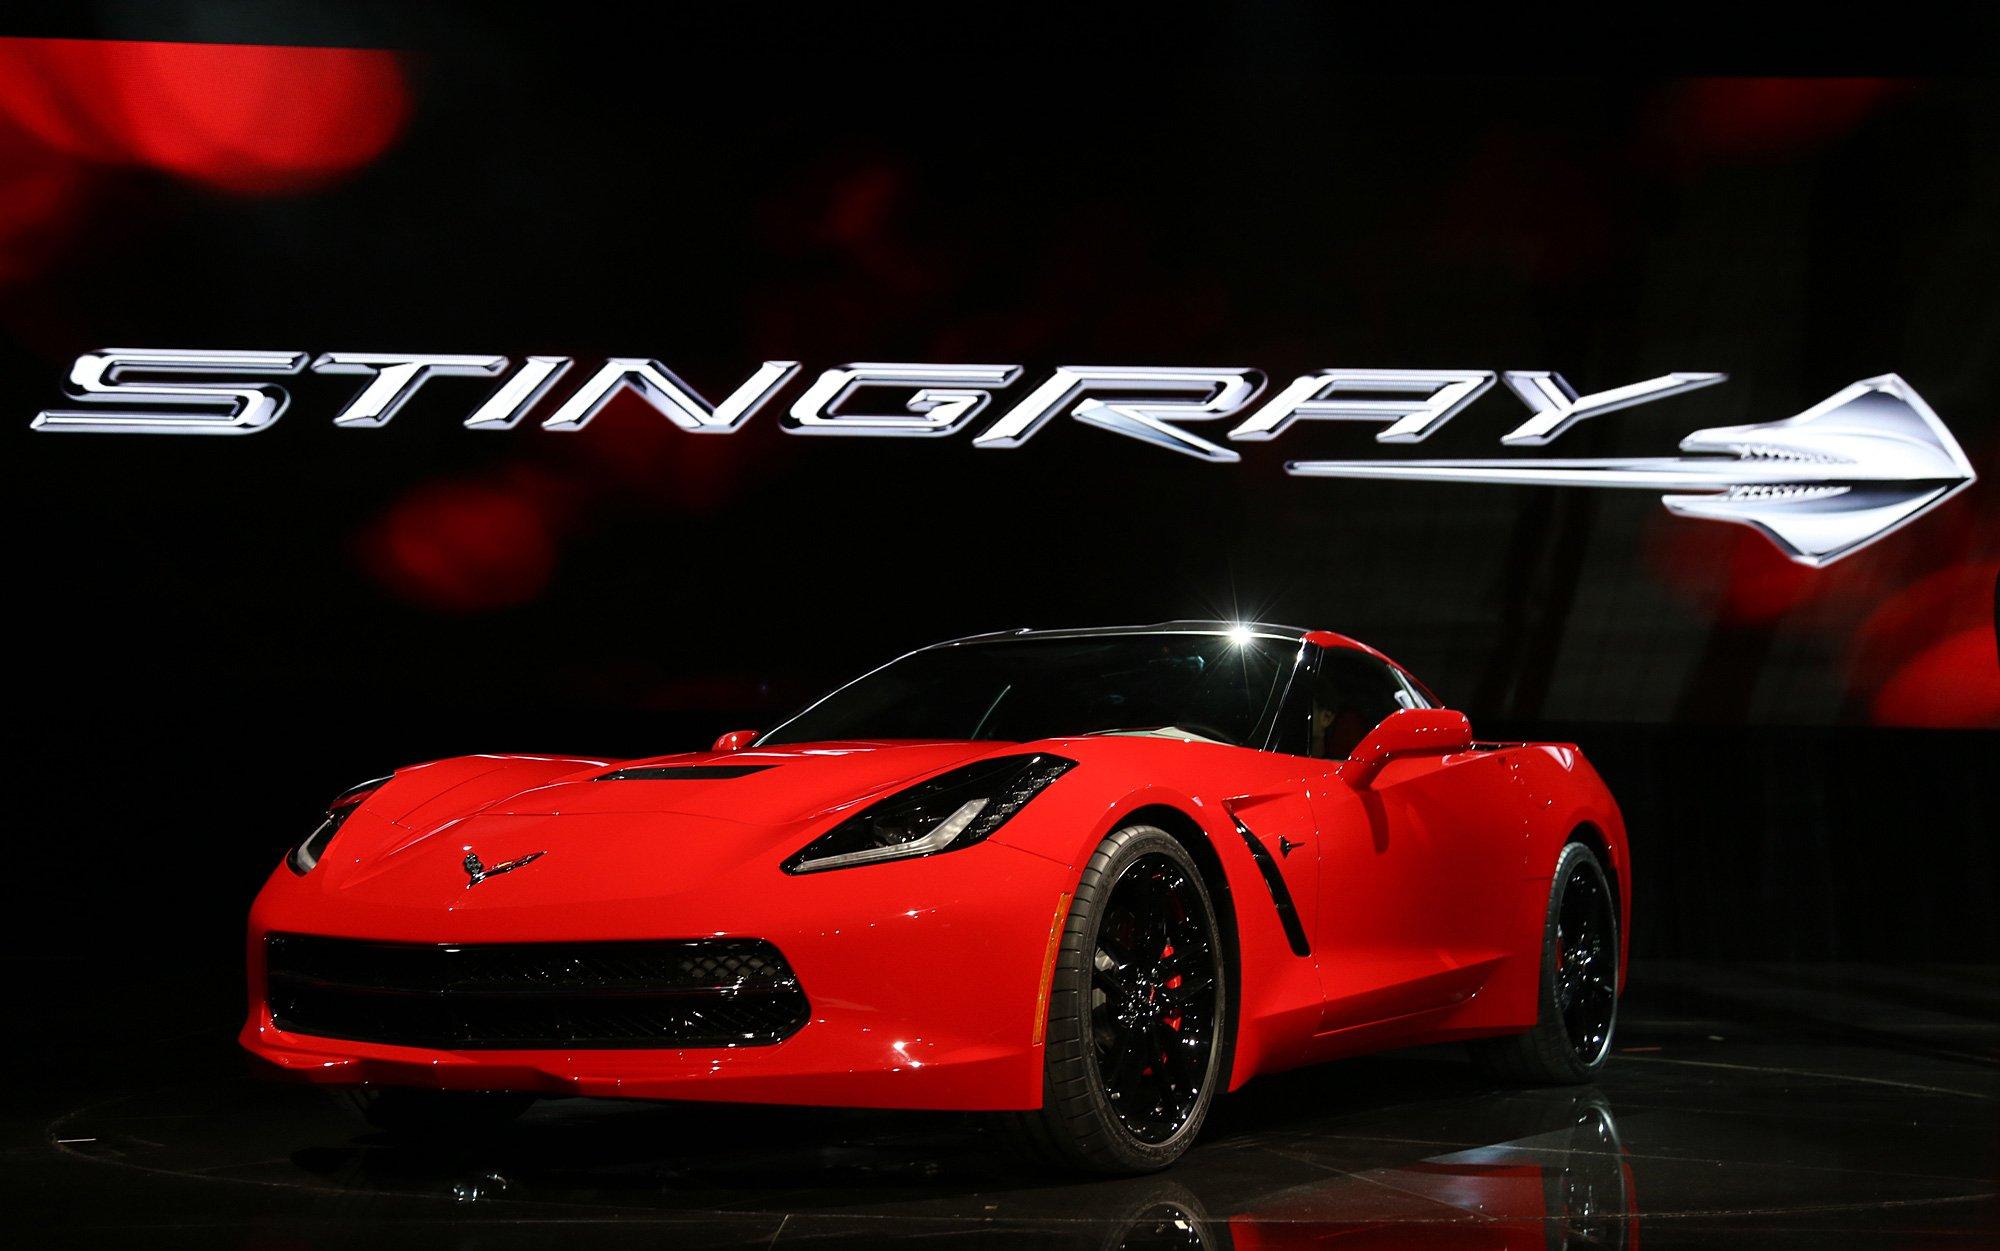 GT5 2014 Corvette Stingray C7 Wallpaper 19201080 Engine 2000x1251